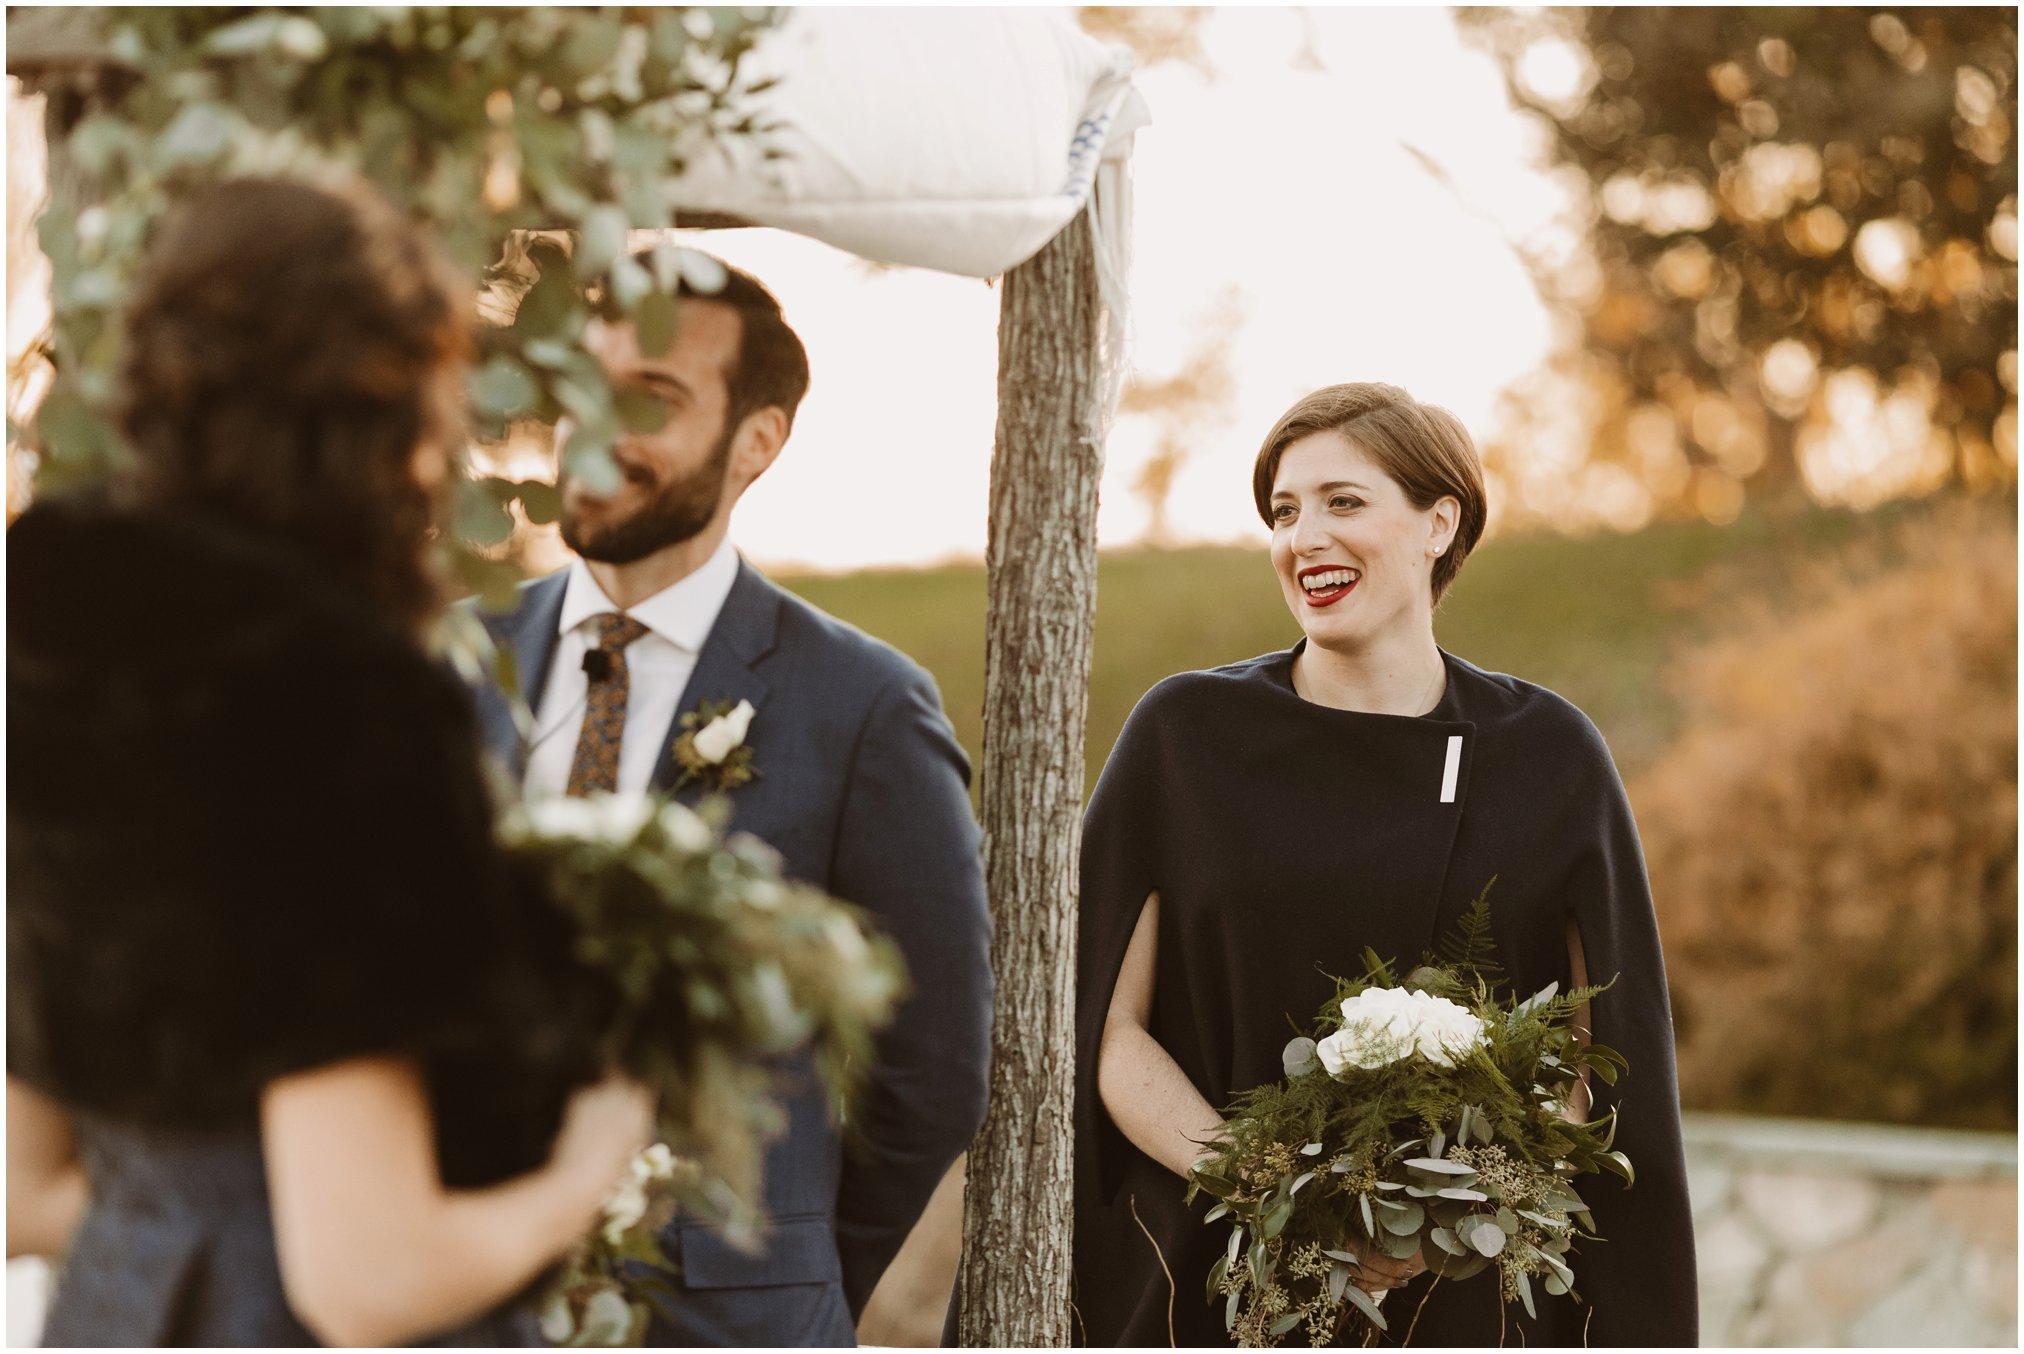 Riverside on the Potomac Wedding, Riverside on the Potomac, Leesburg Wedding,  Virginia Wedding Photographer, Maryland Wedding Photographer, Fall Wedding, Kate Ann Photography